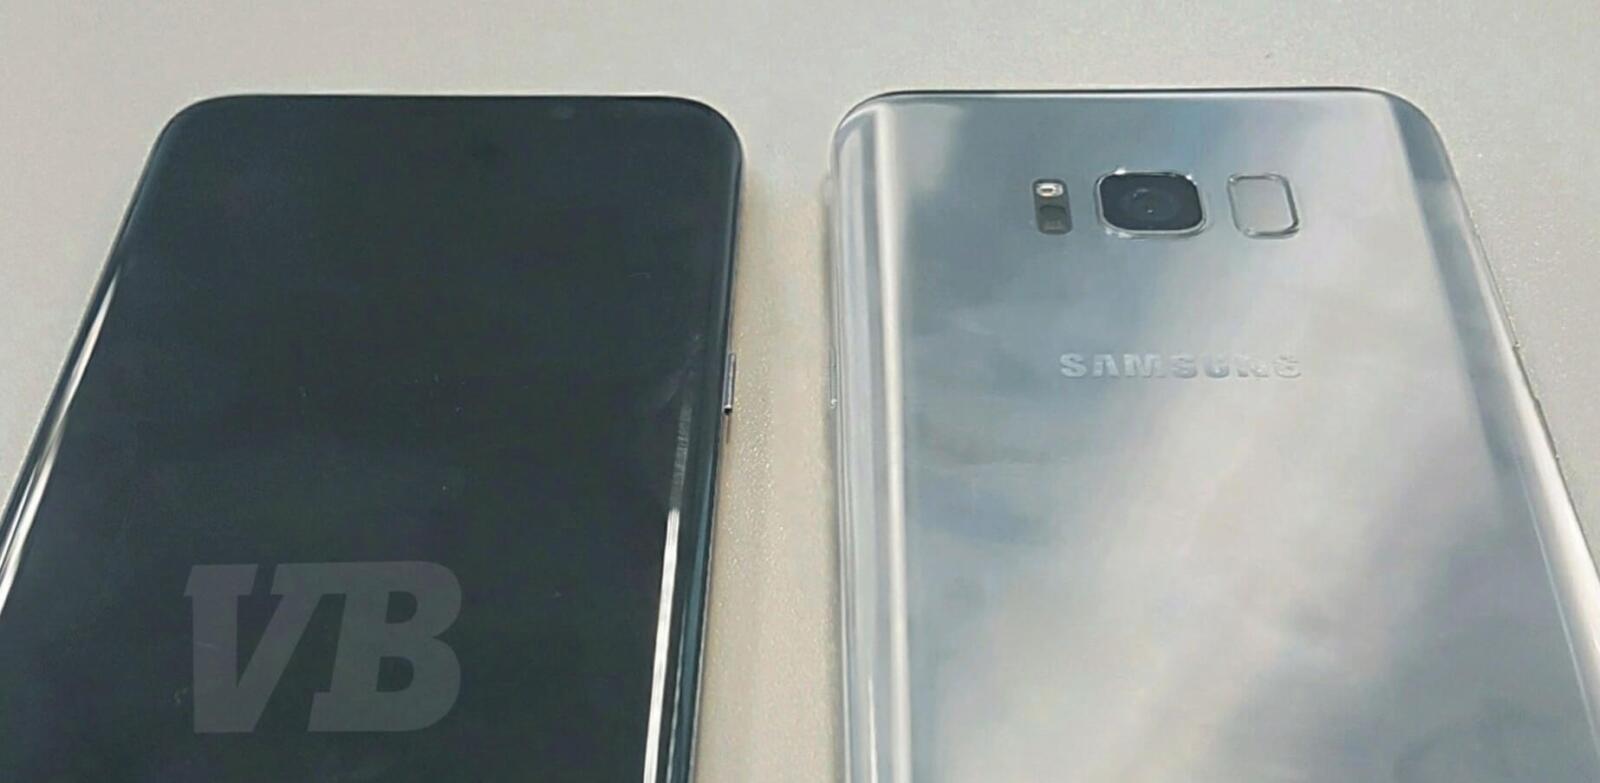 1 Android datum galaxy preis s8 Samsung spezifikationen